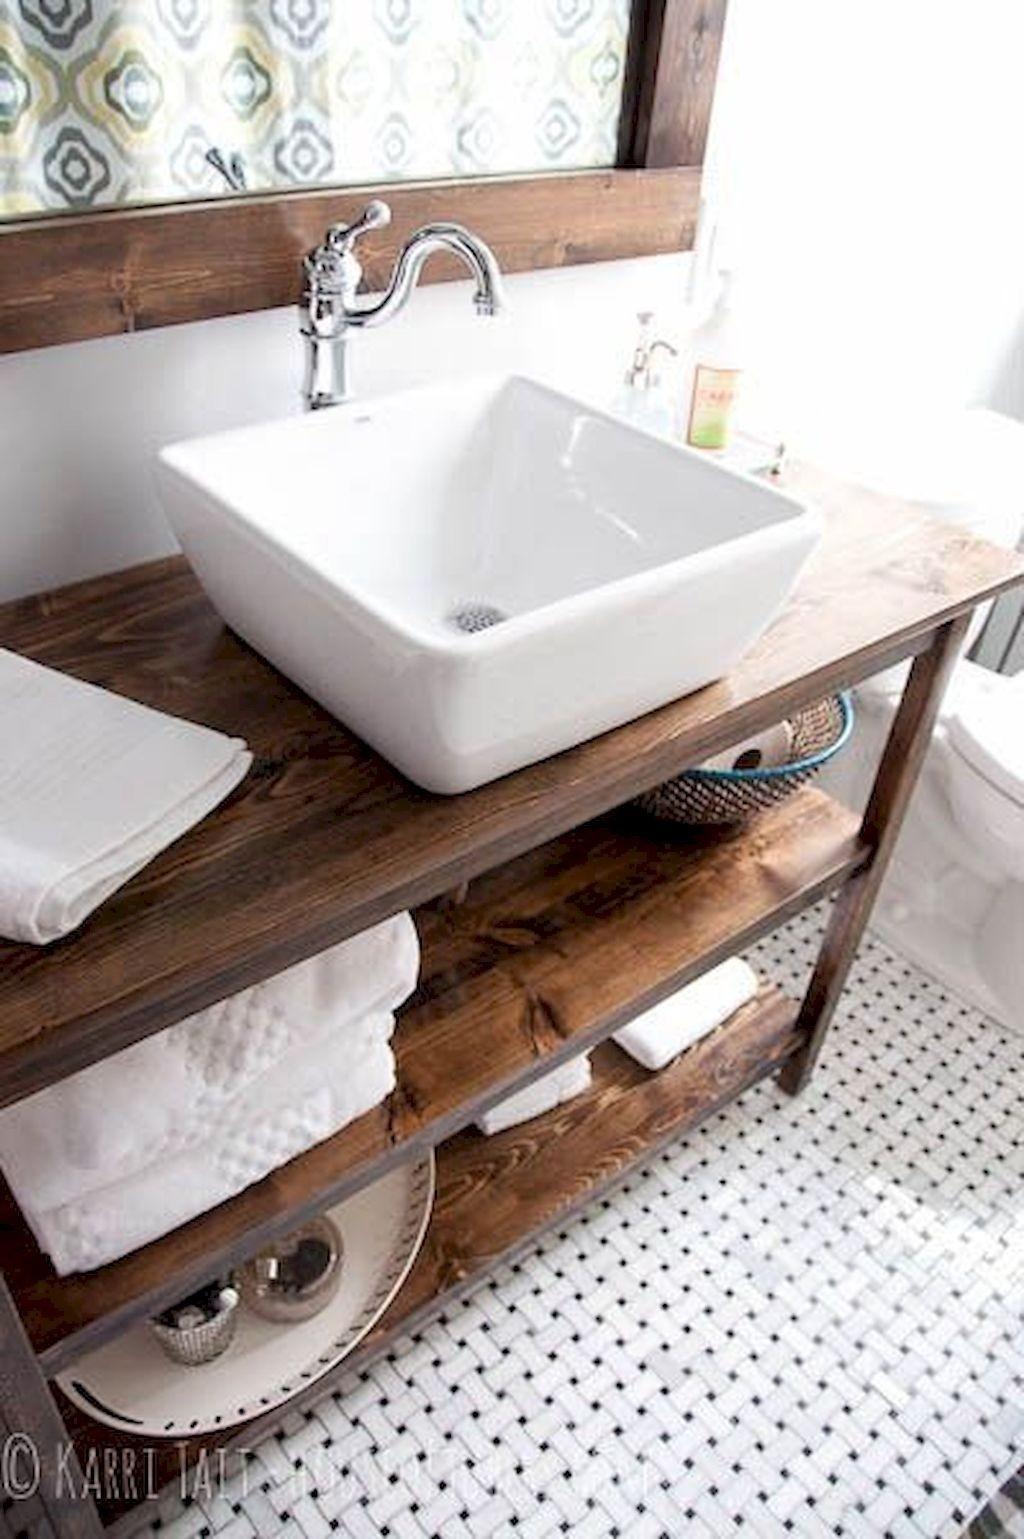 Rustic Vessel Sinks